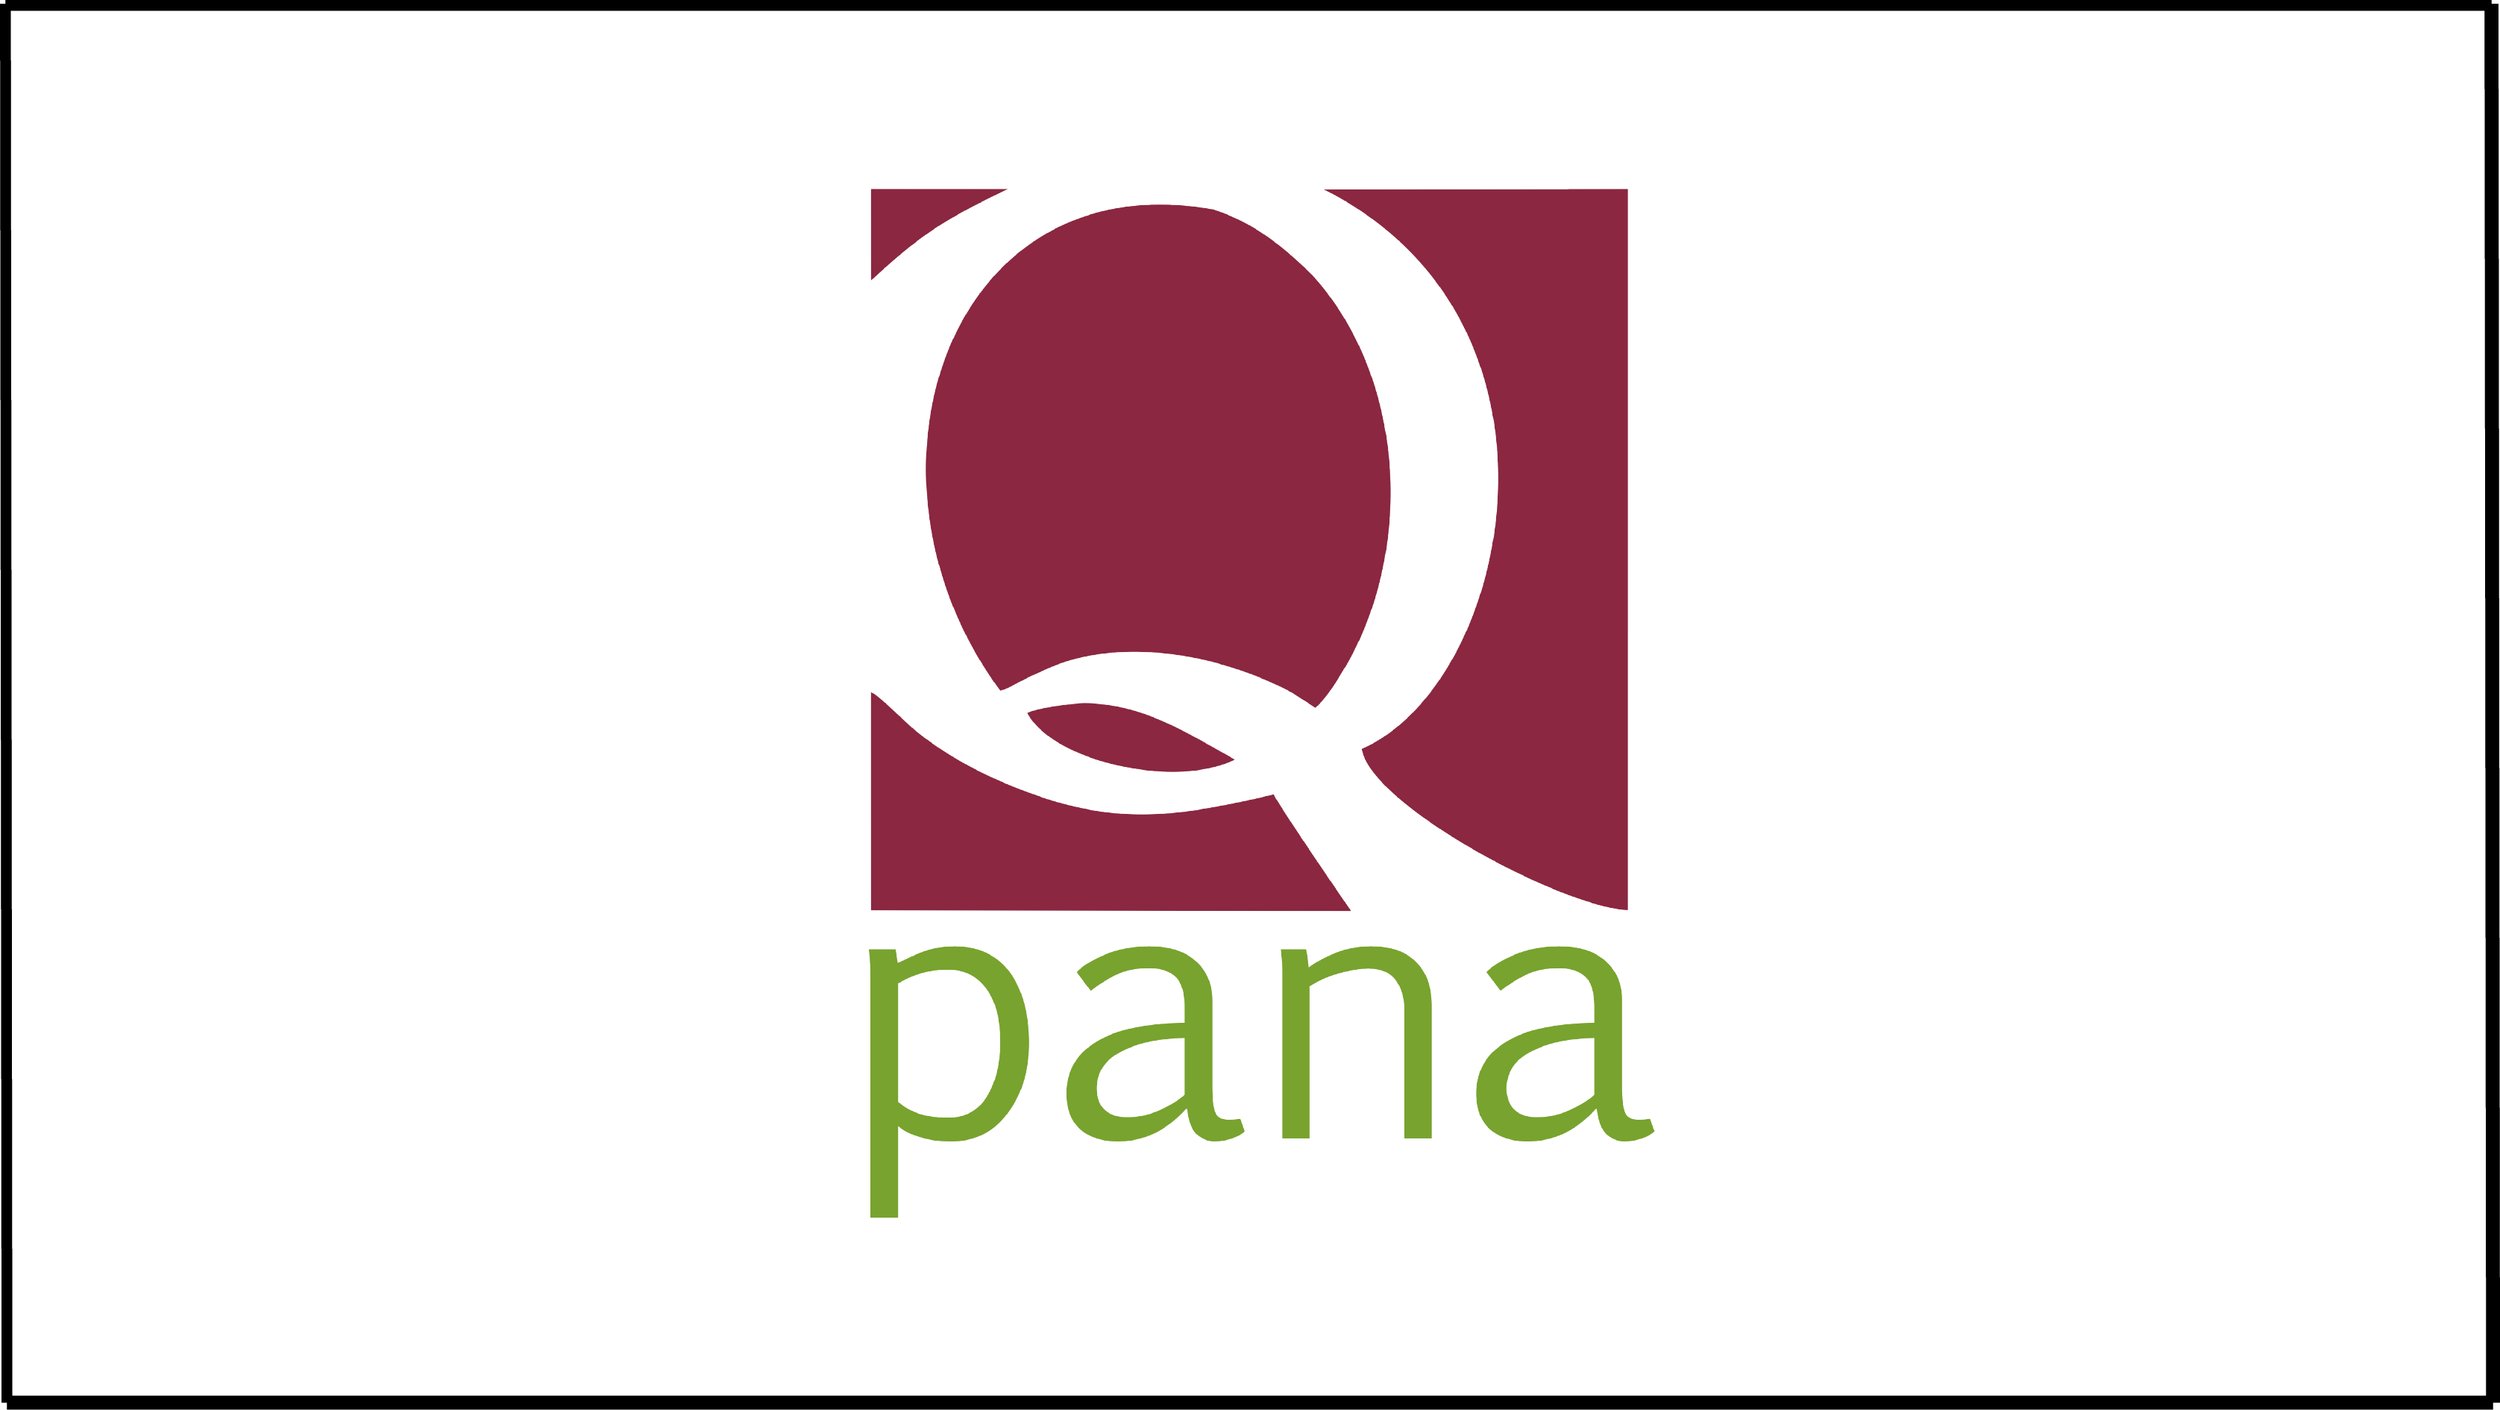 Qpana.png